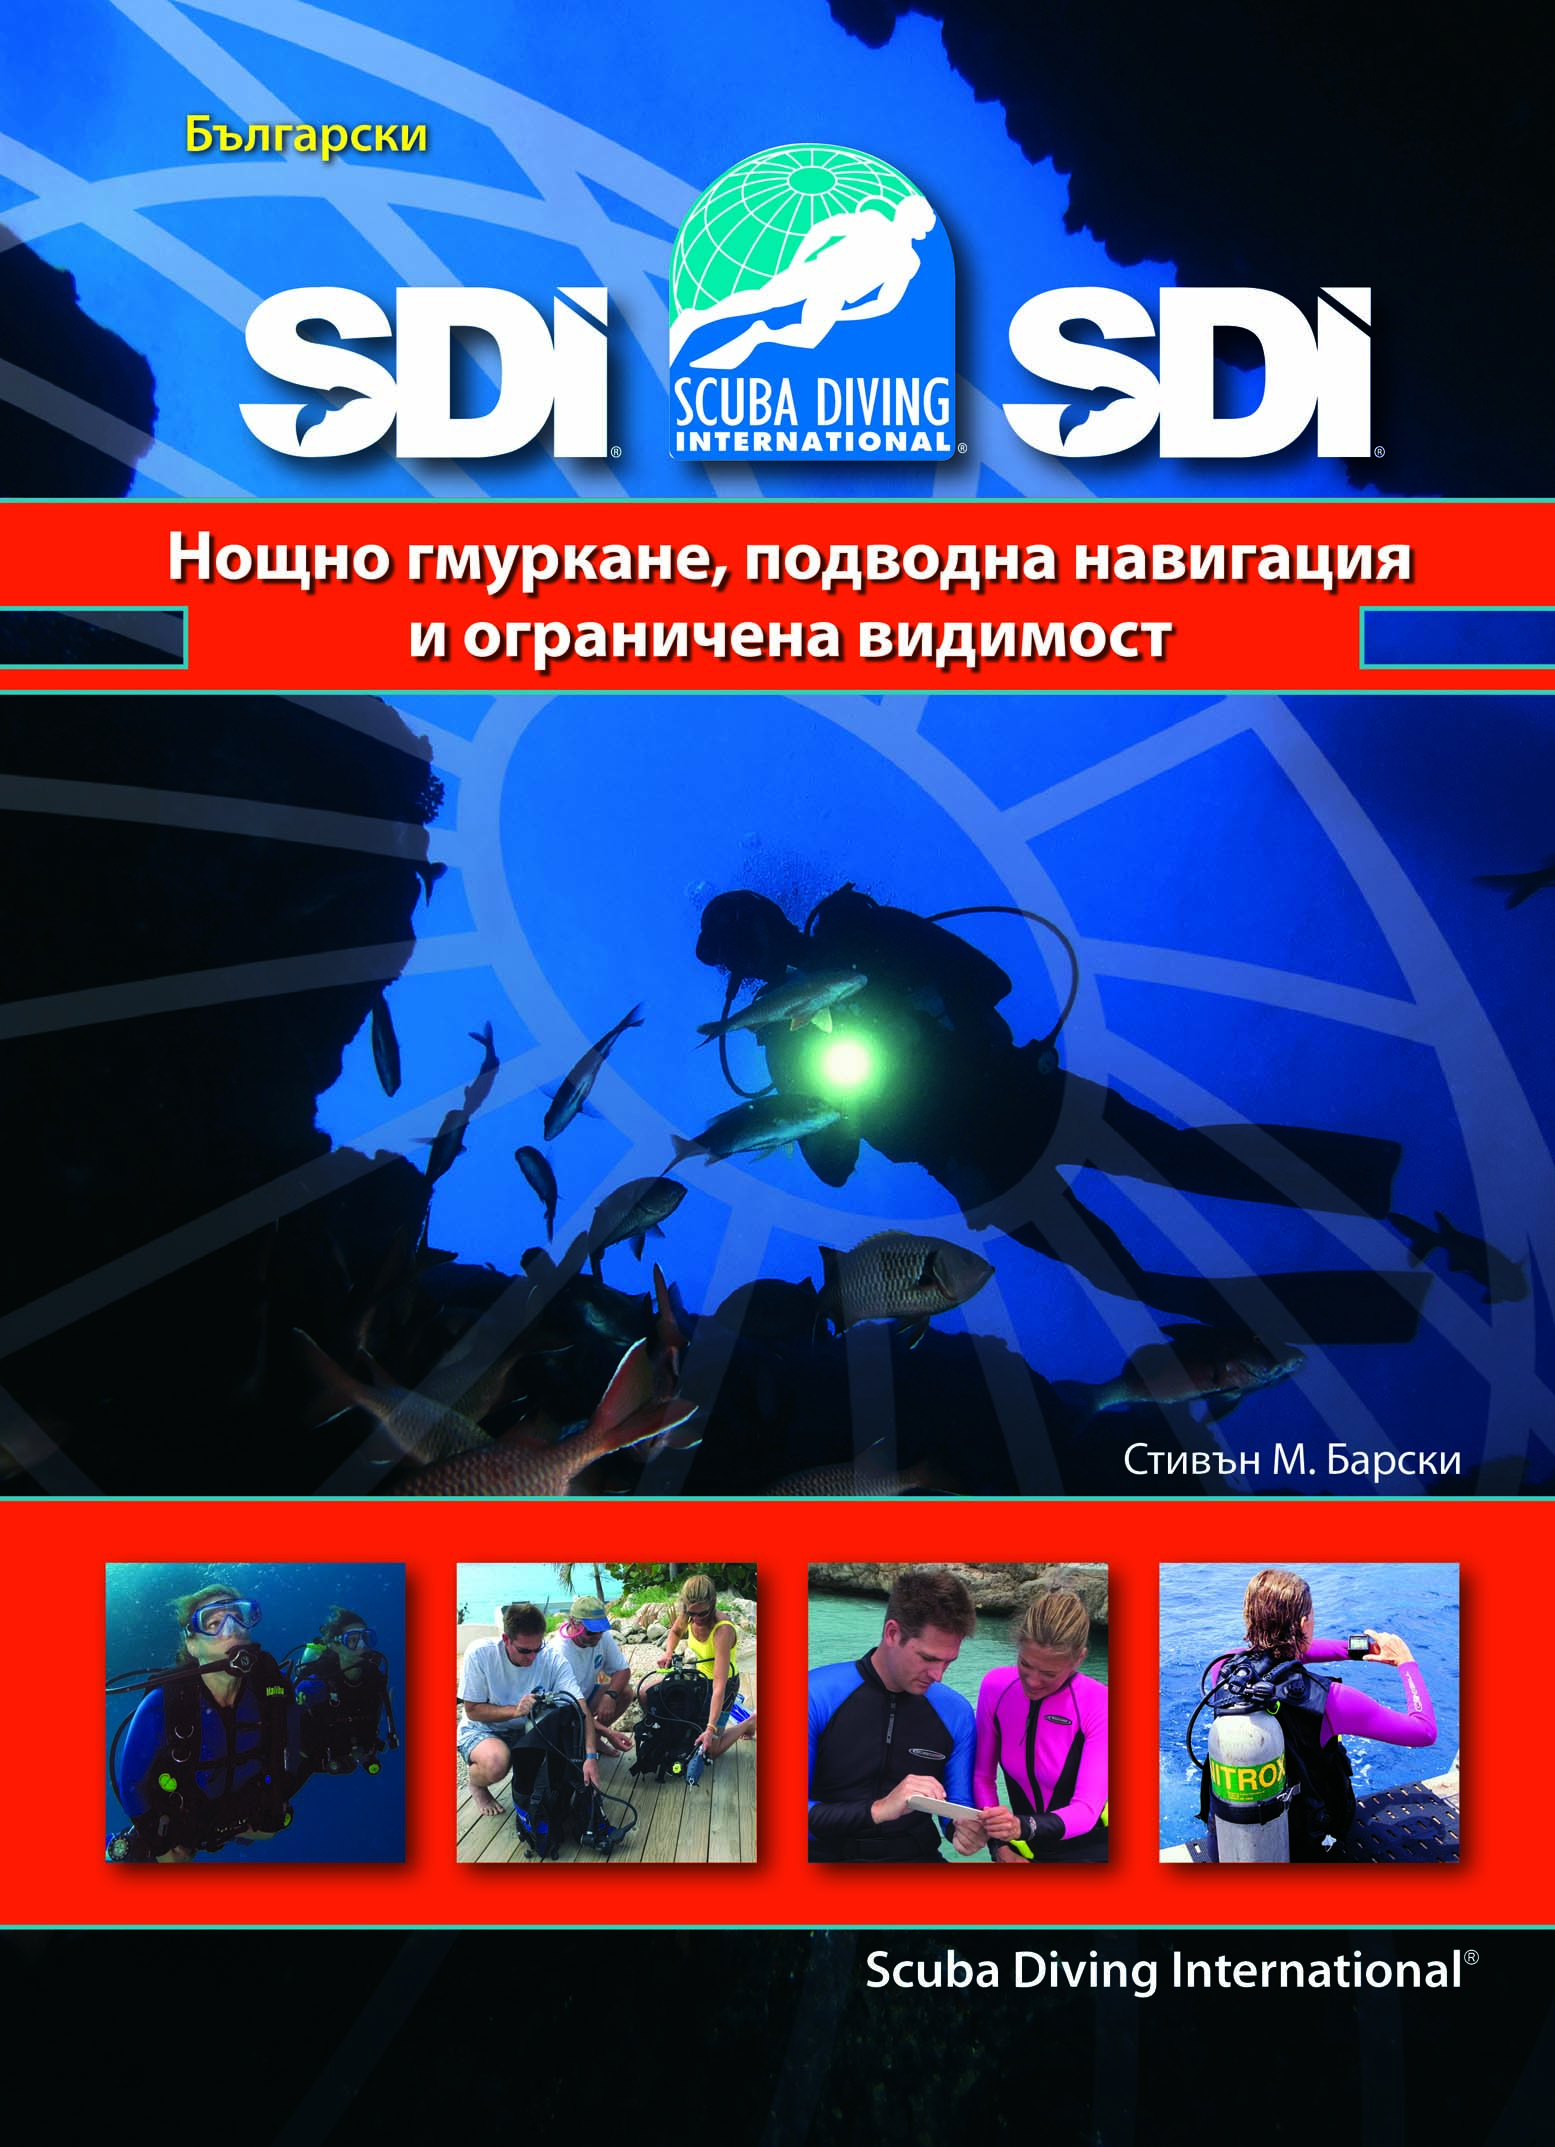 SDI Нощно гмуркане, подводна навигация и ограничена видимост ( SDI Night, Low Visibility and Underwater Navigation ) - учебник на български език